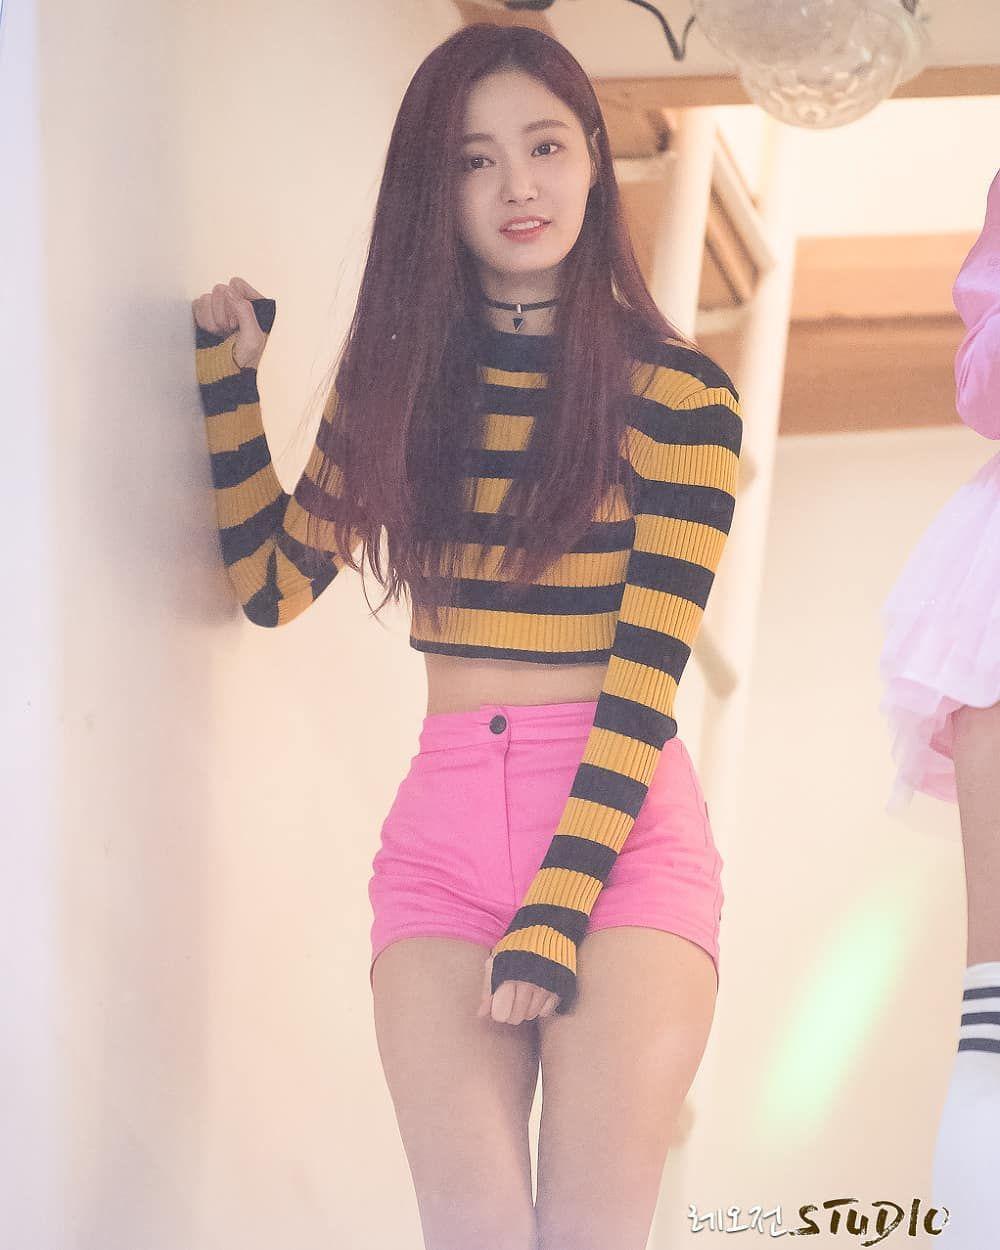 Ultleedabin On Instagram 2018 Yeonwoo Leedabin Momoland Kpop Korean Girl Women Korean Idol